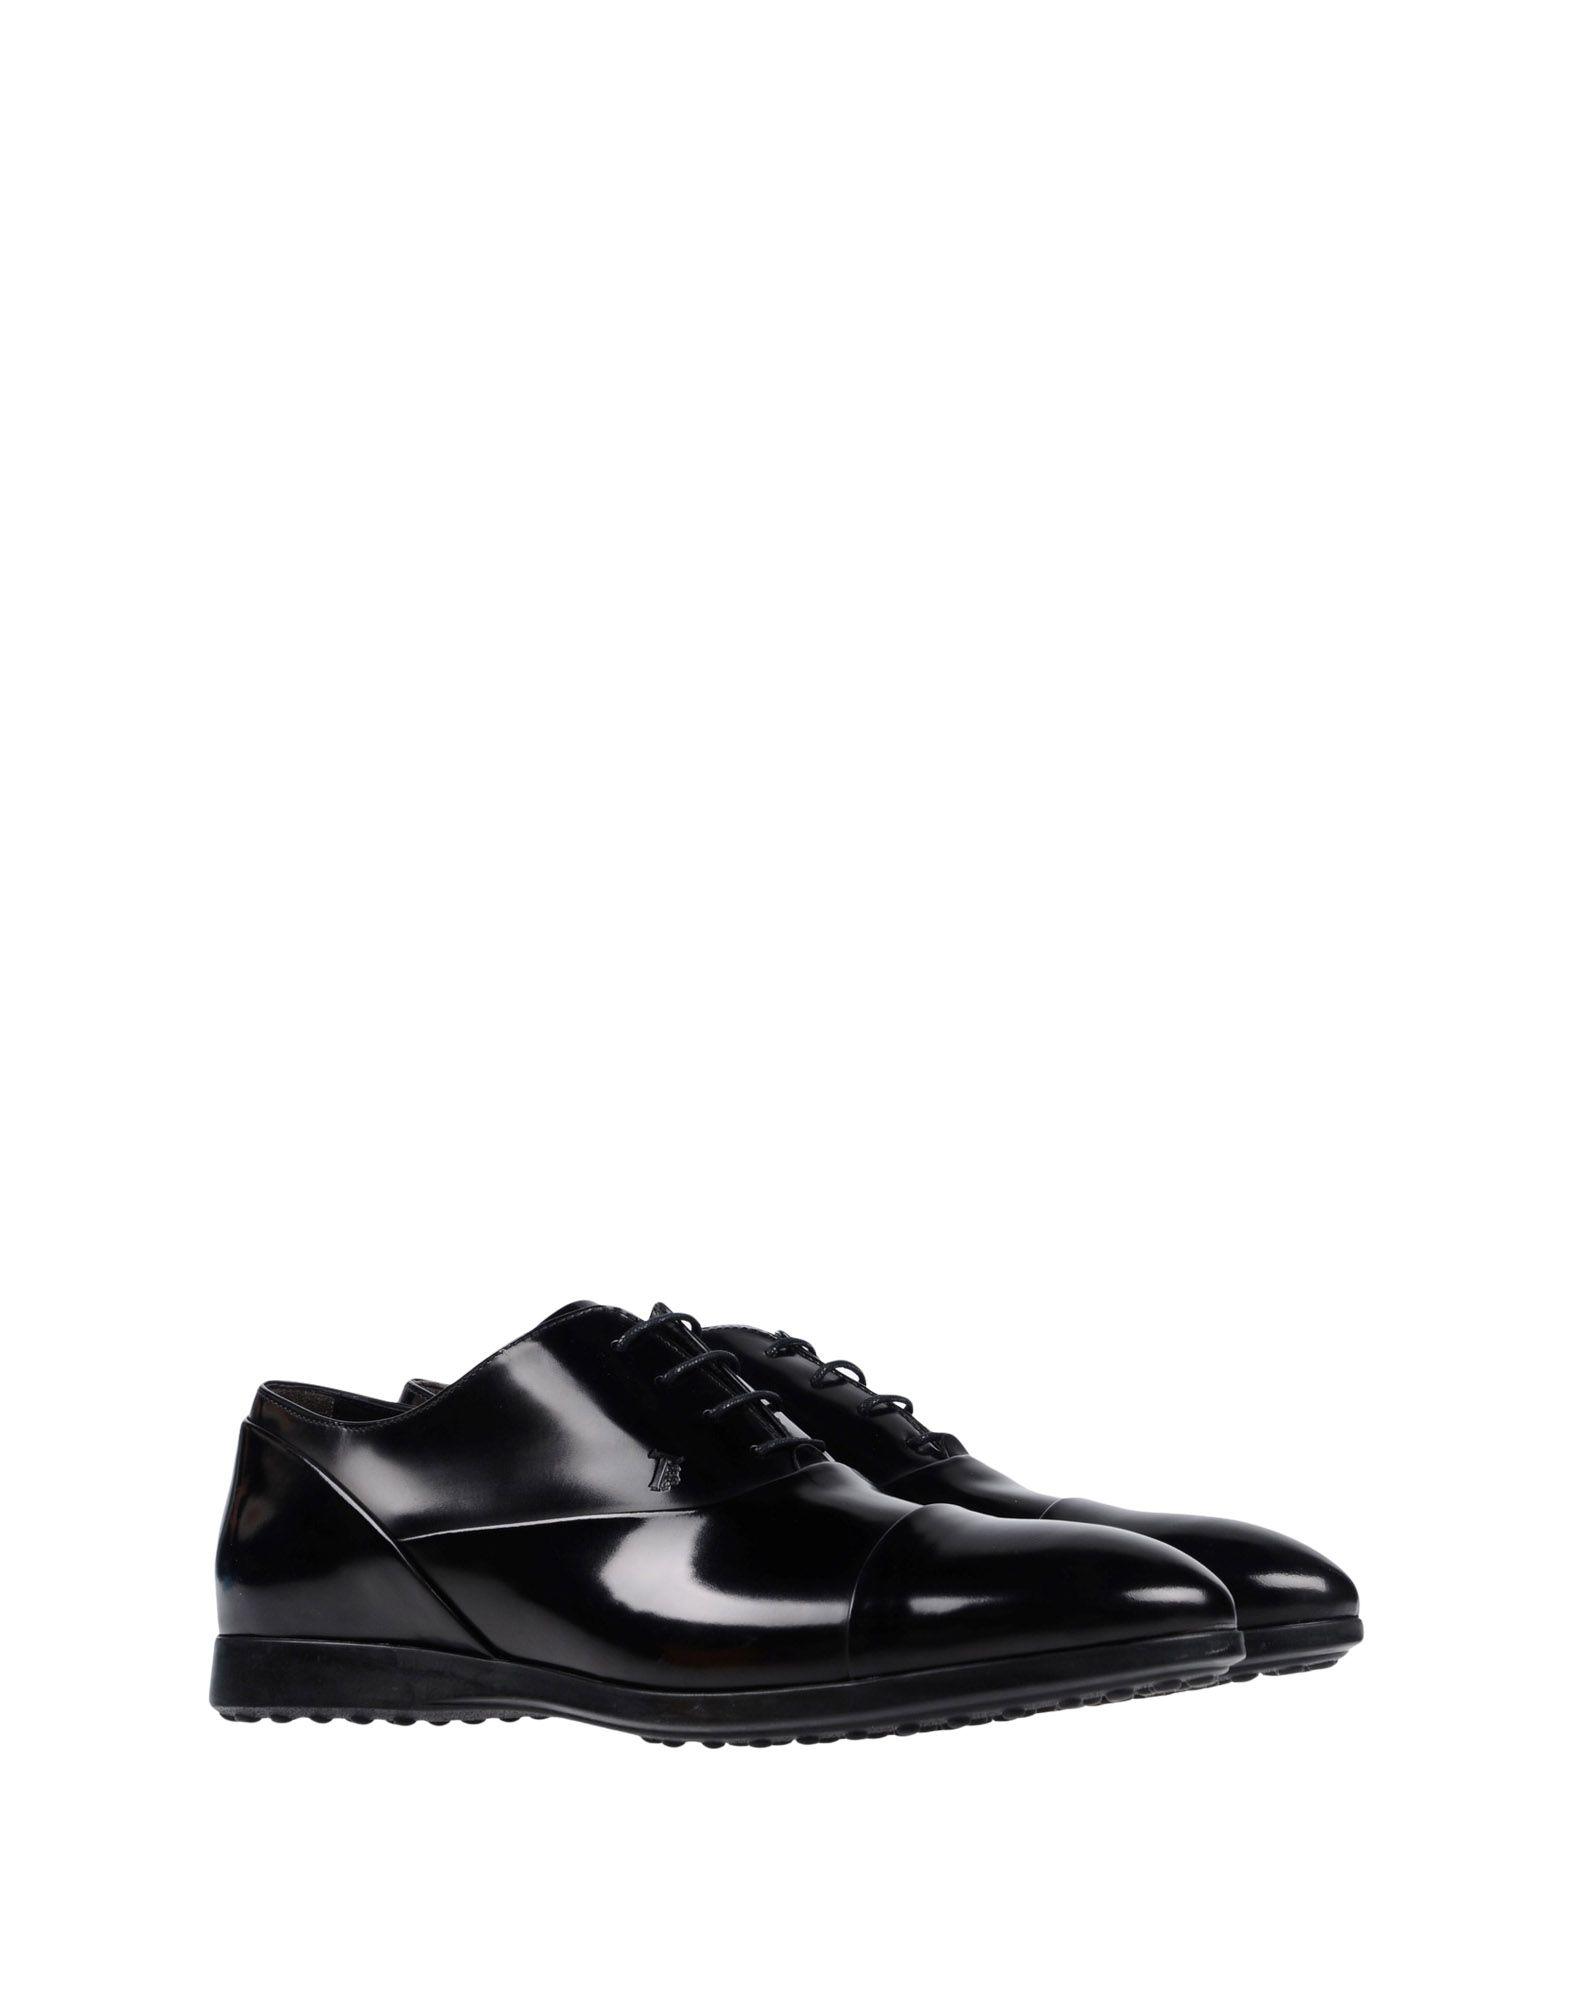 Tod's 11427092RL Schnürschuhe Herren  11427092RL Tod's Gute Qualität beliebte Schuhe 95796b